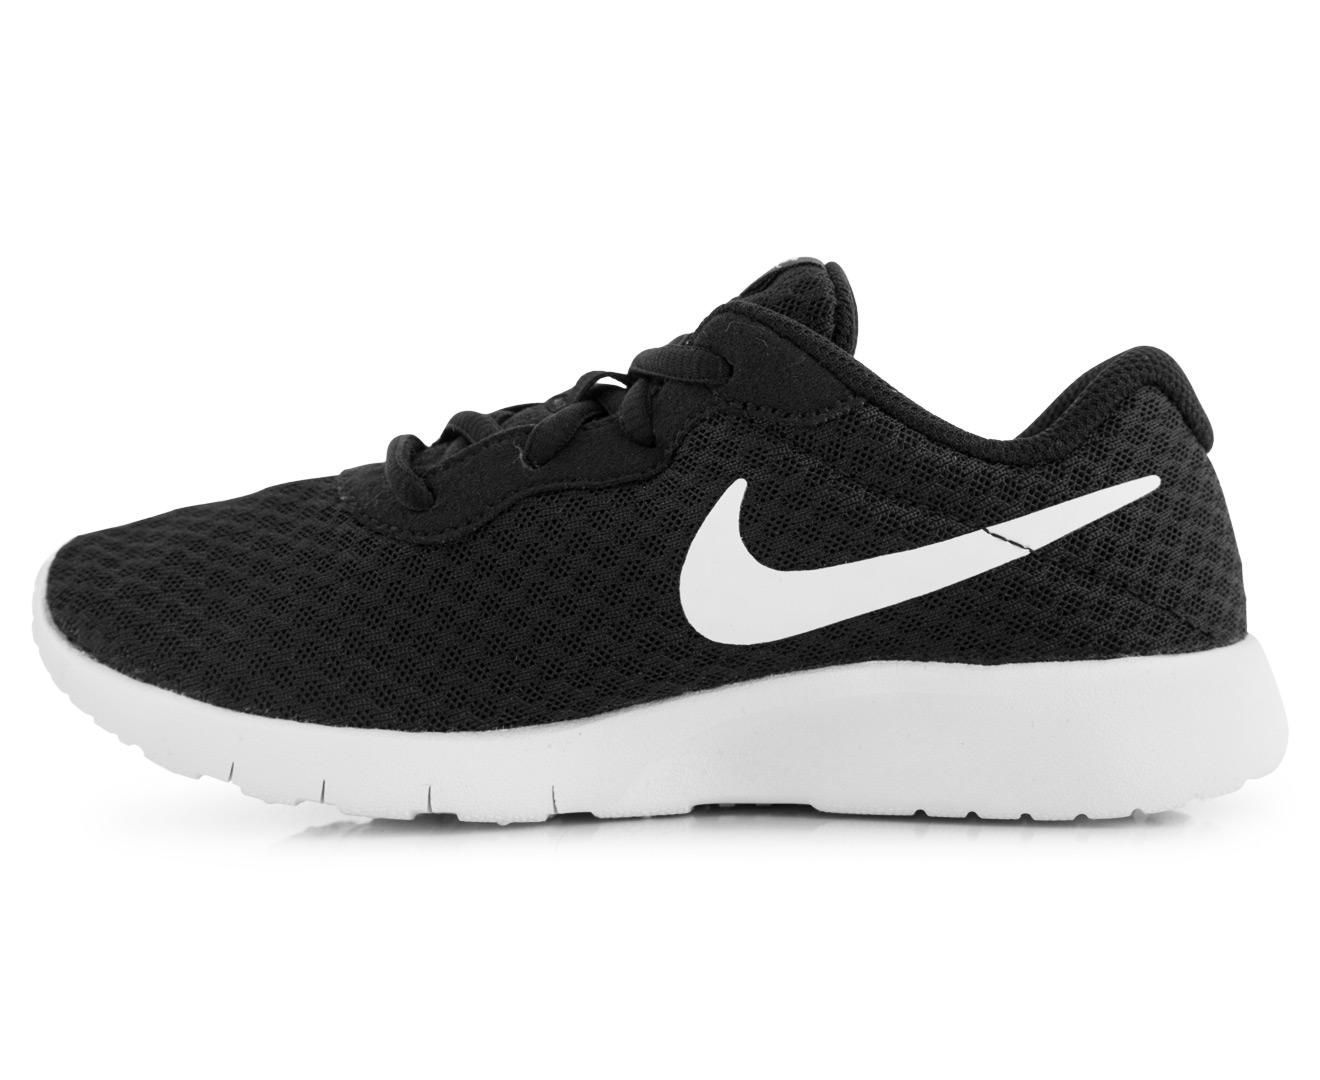 e460f9ad1130c Womens Nike Free Viritous Running Shoes White Sneakers Girl